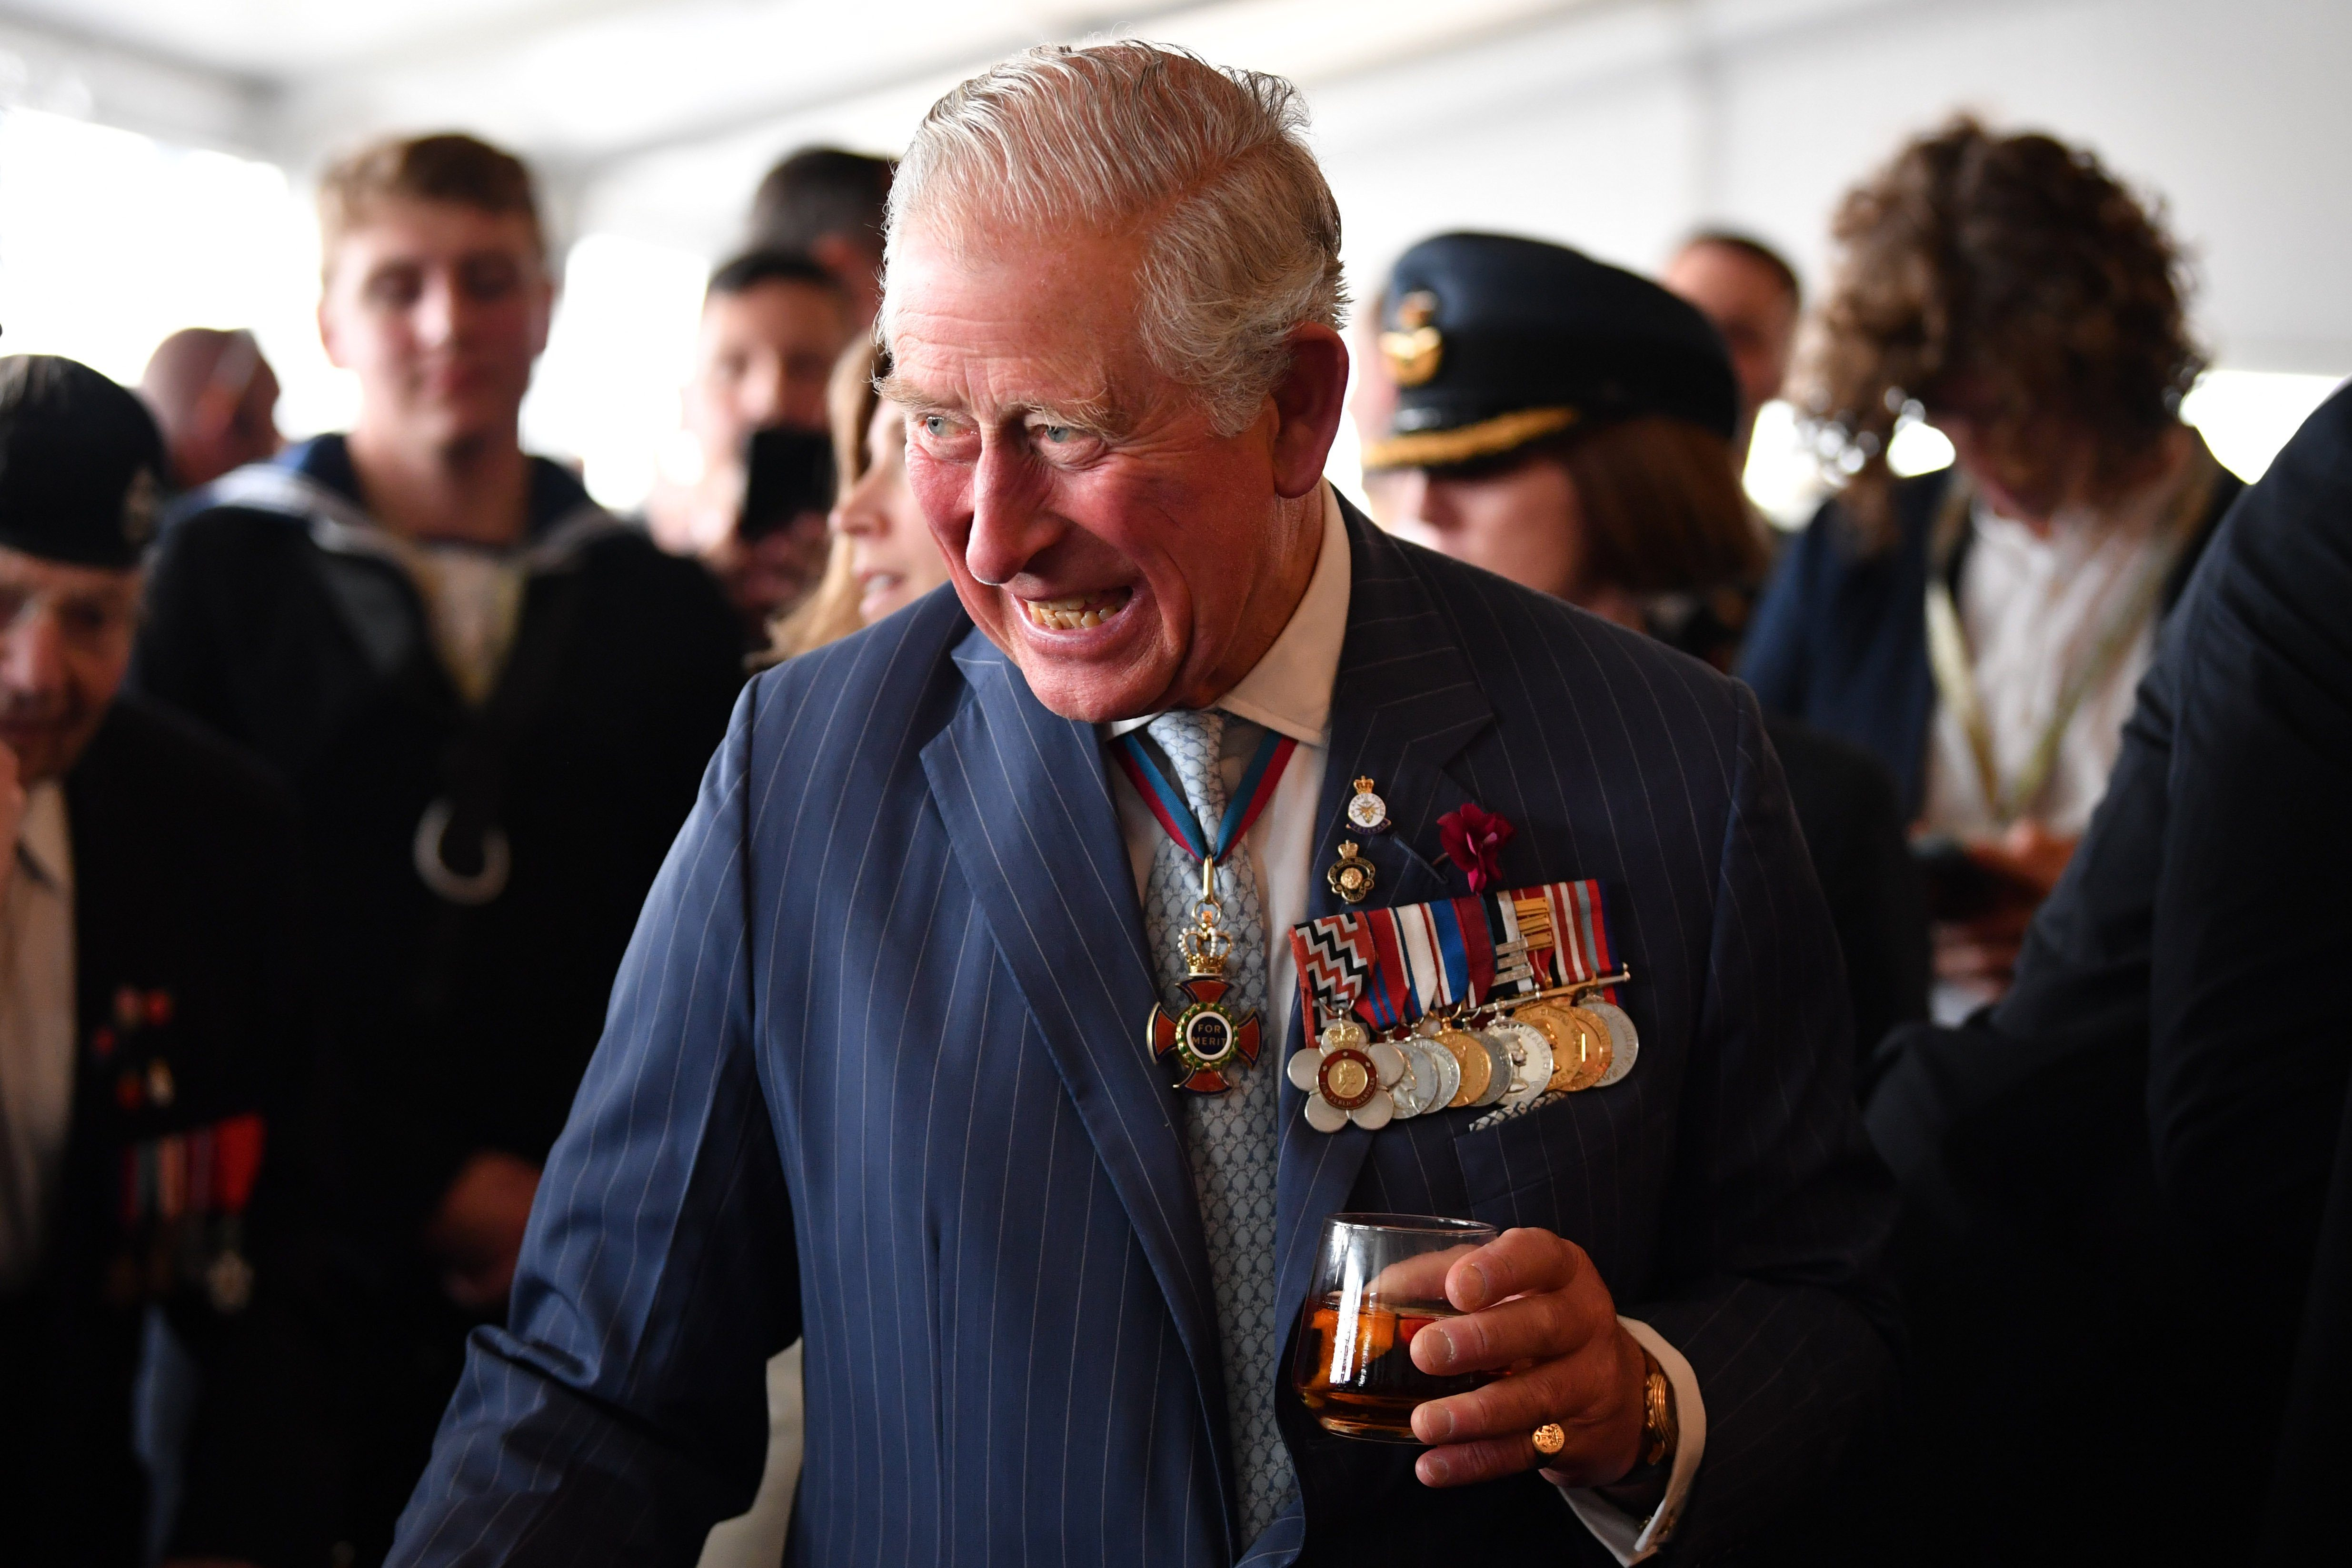 Prince Charles meets veterans 5 Jun 2019